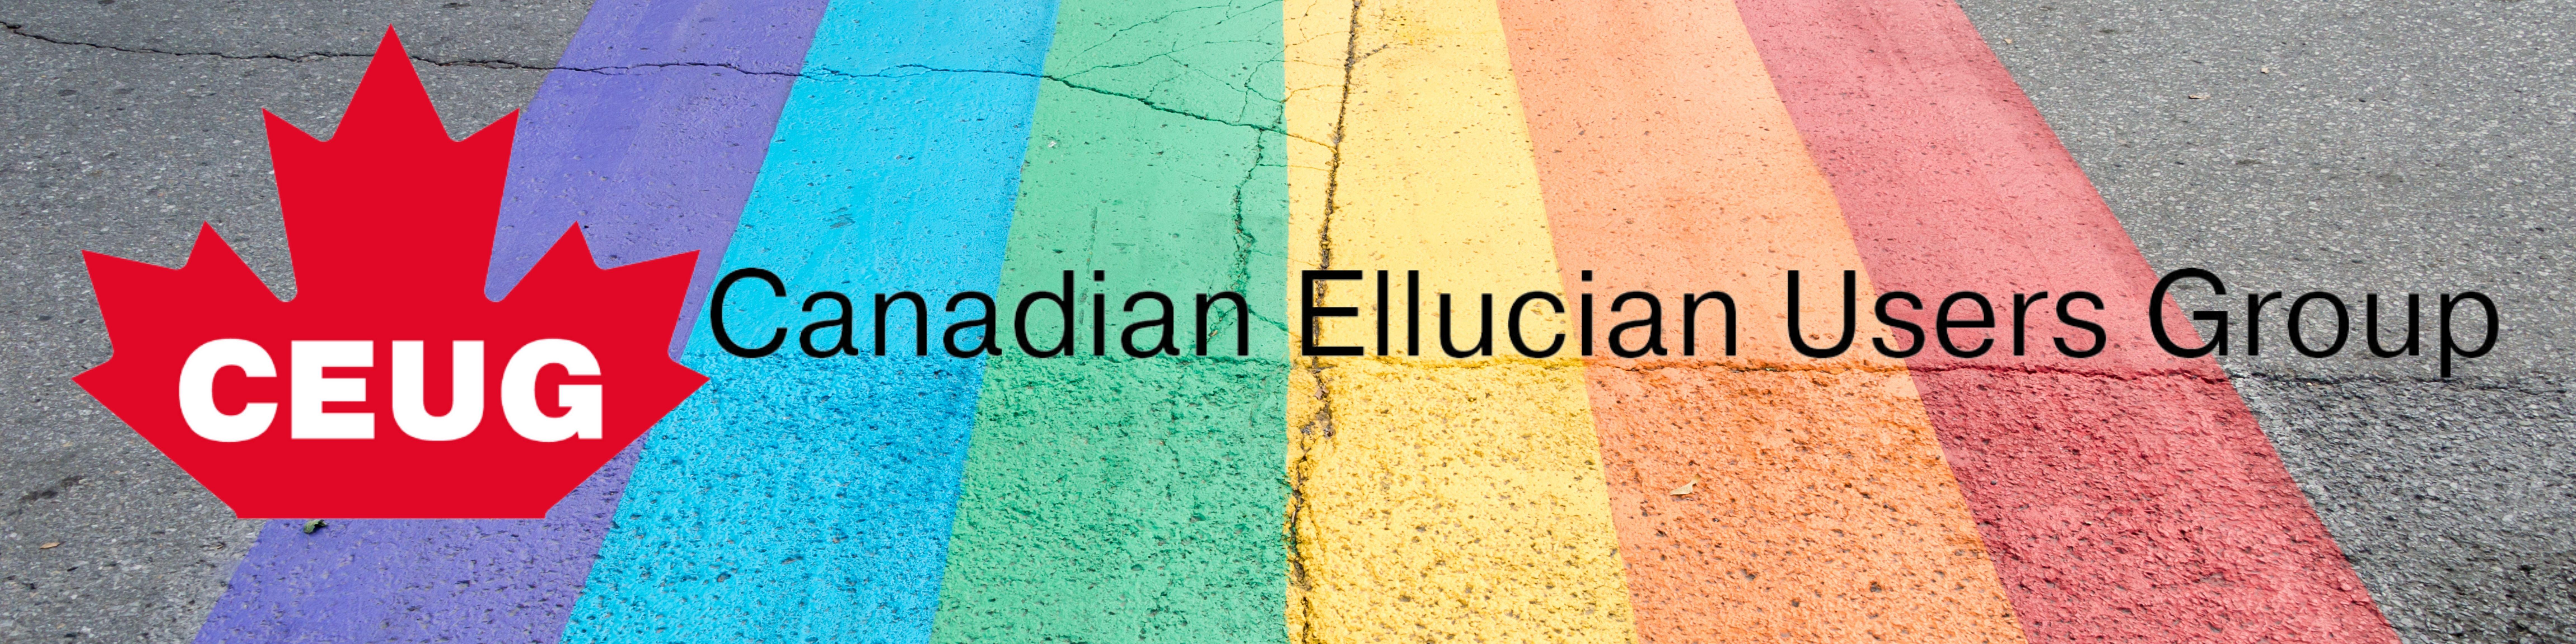 Canadian Ellucian Users Group (CEUG)